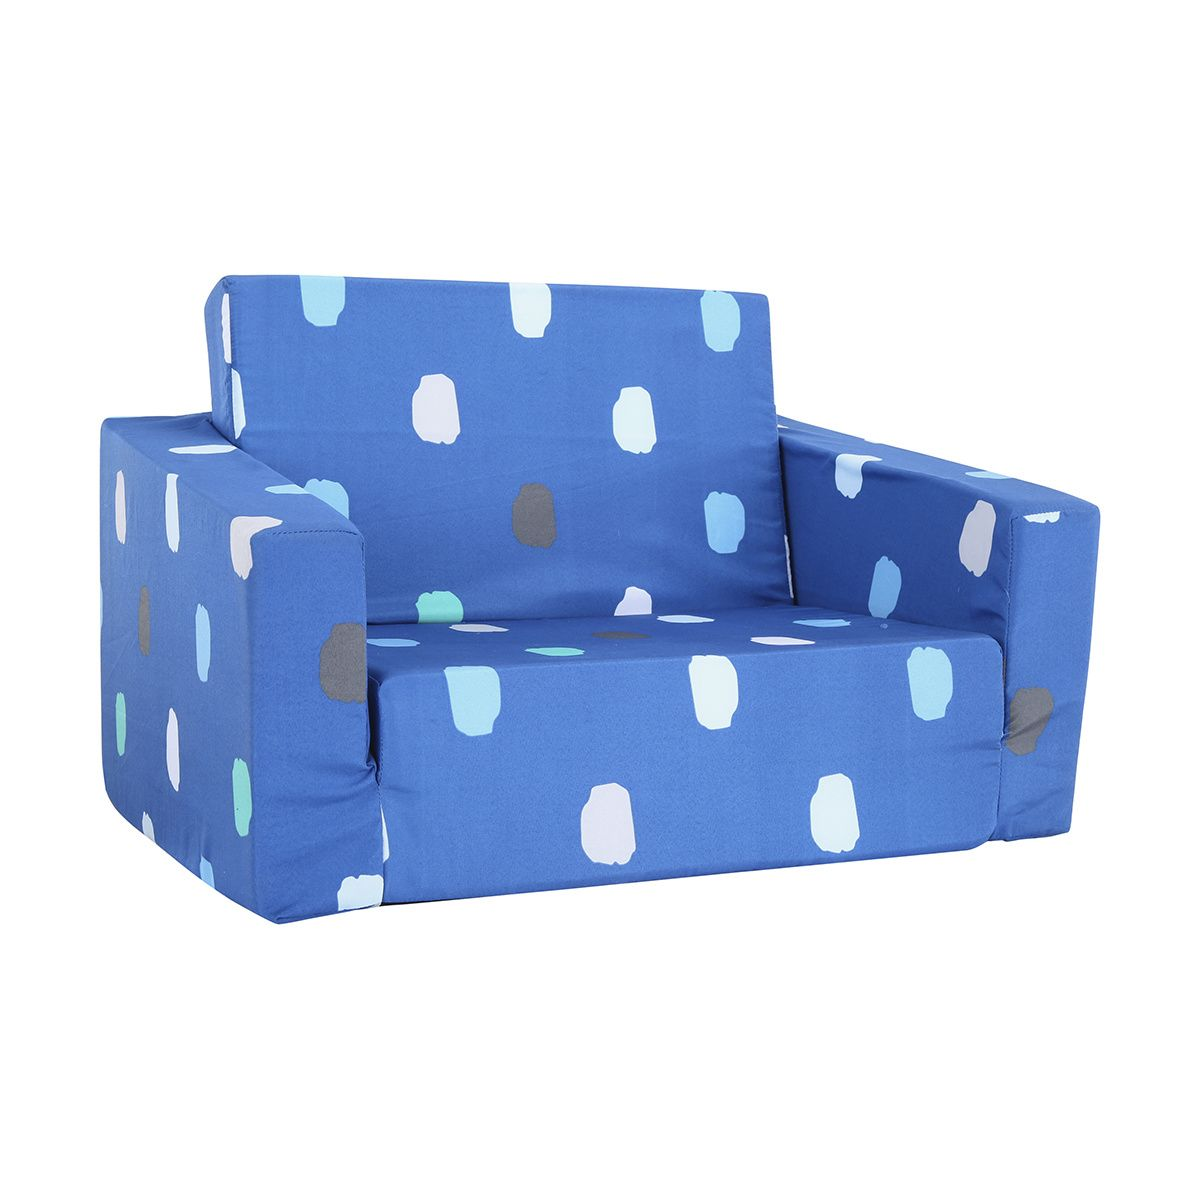 Flipout Sofa Splash Kmart